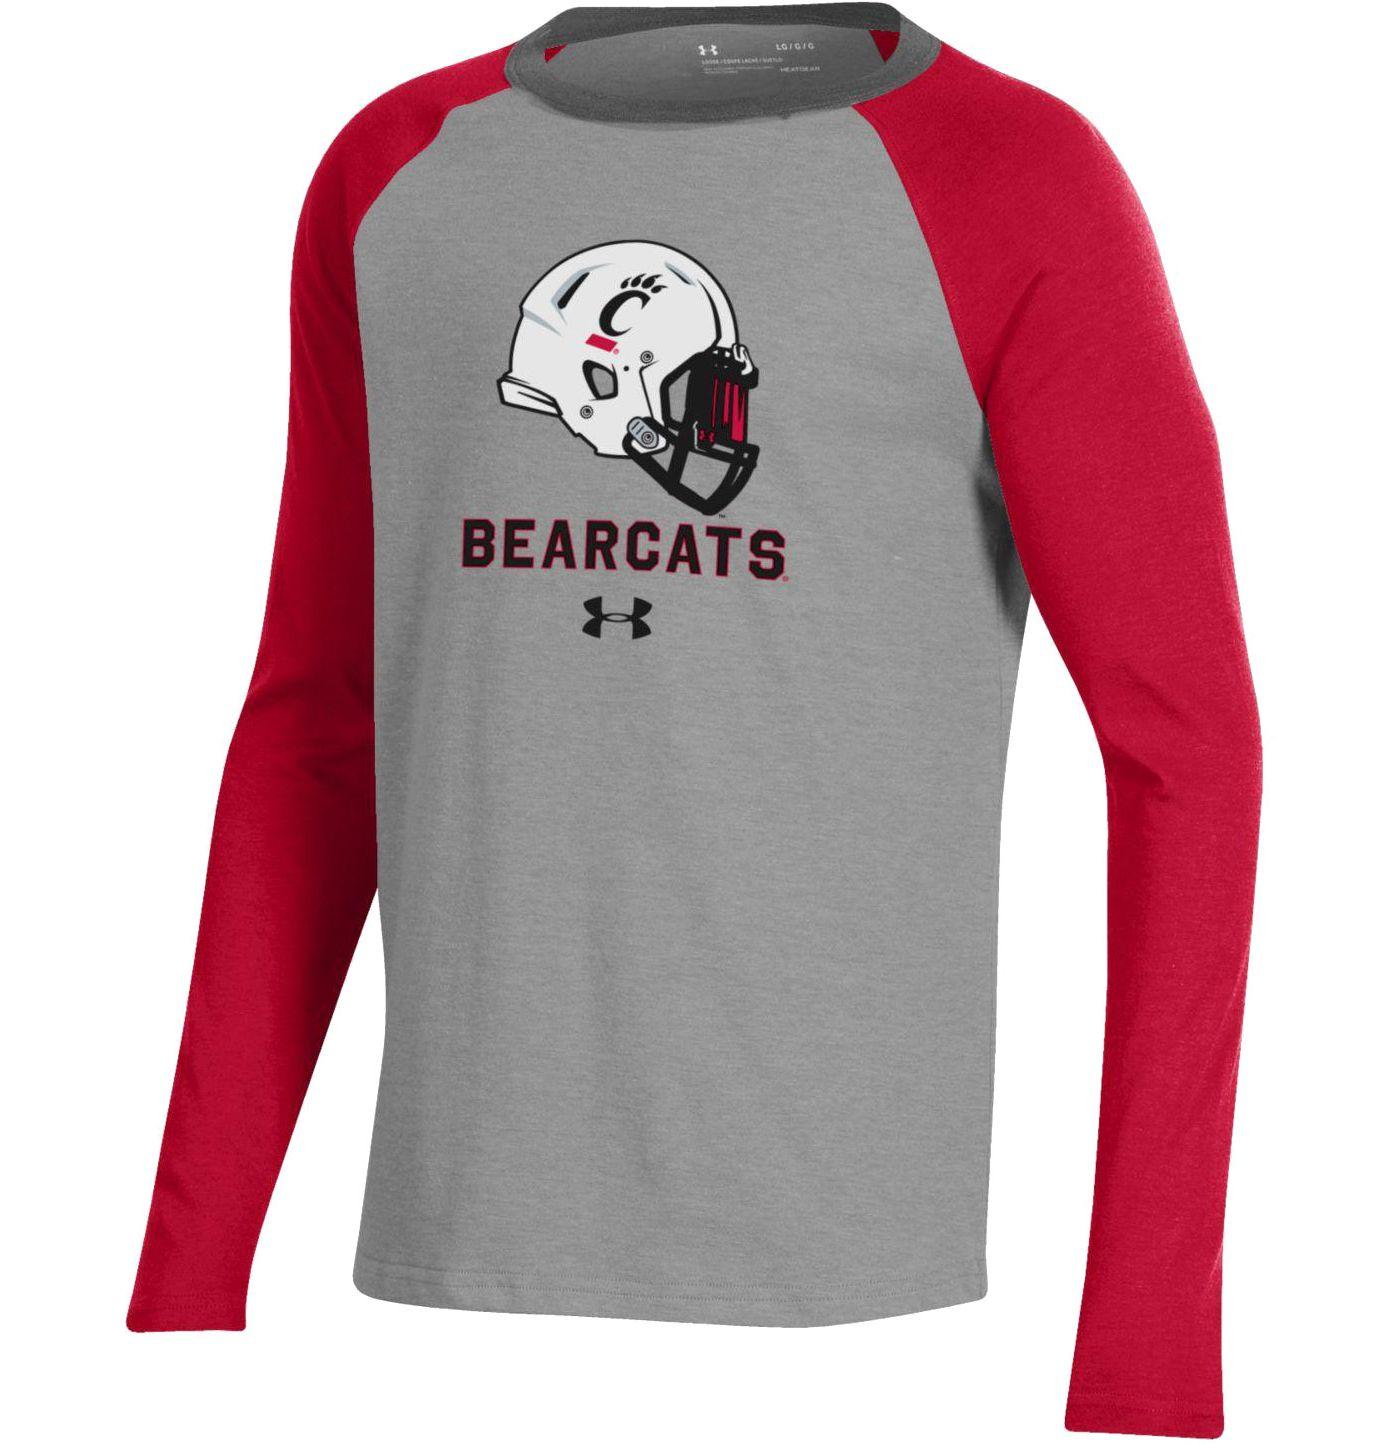 Under Armour Youth Cincinnati Bearcats Grey/Red Performance Cotton Football T-Shirt